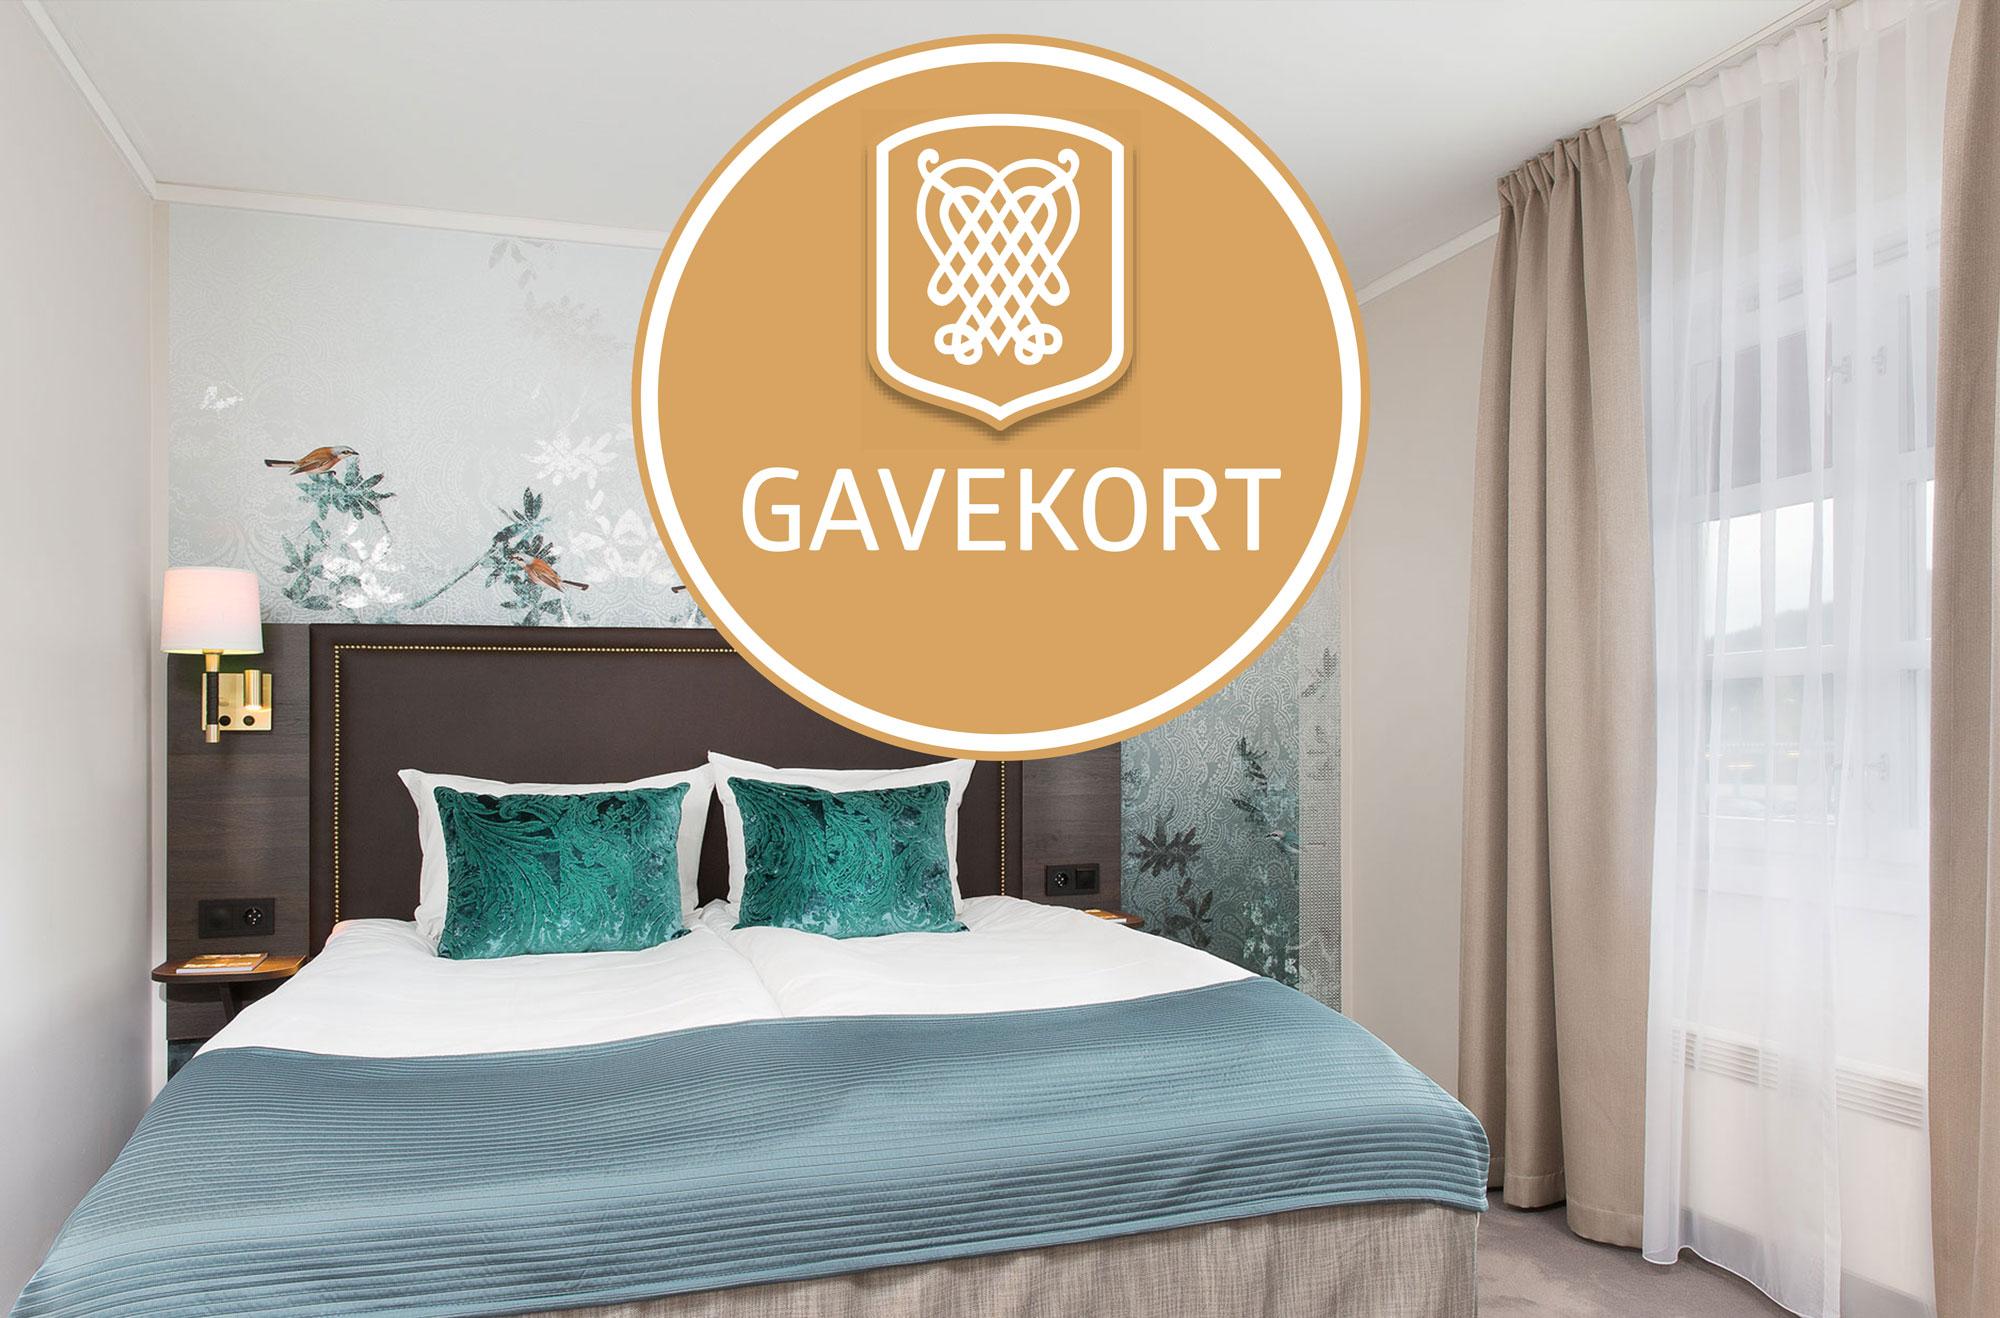 Gavekort overnatting